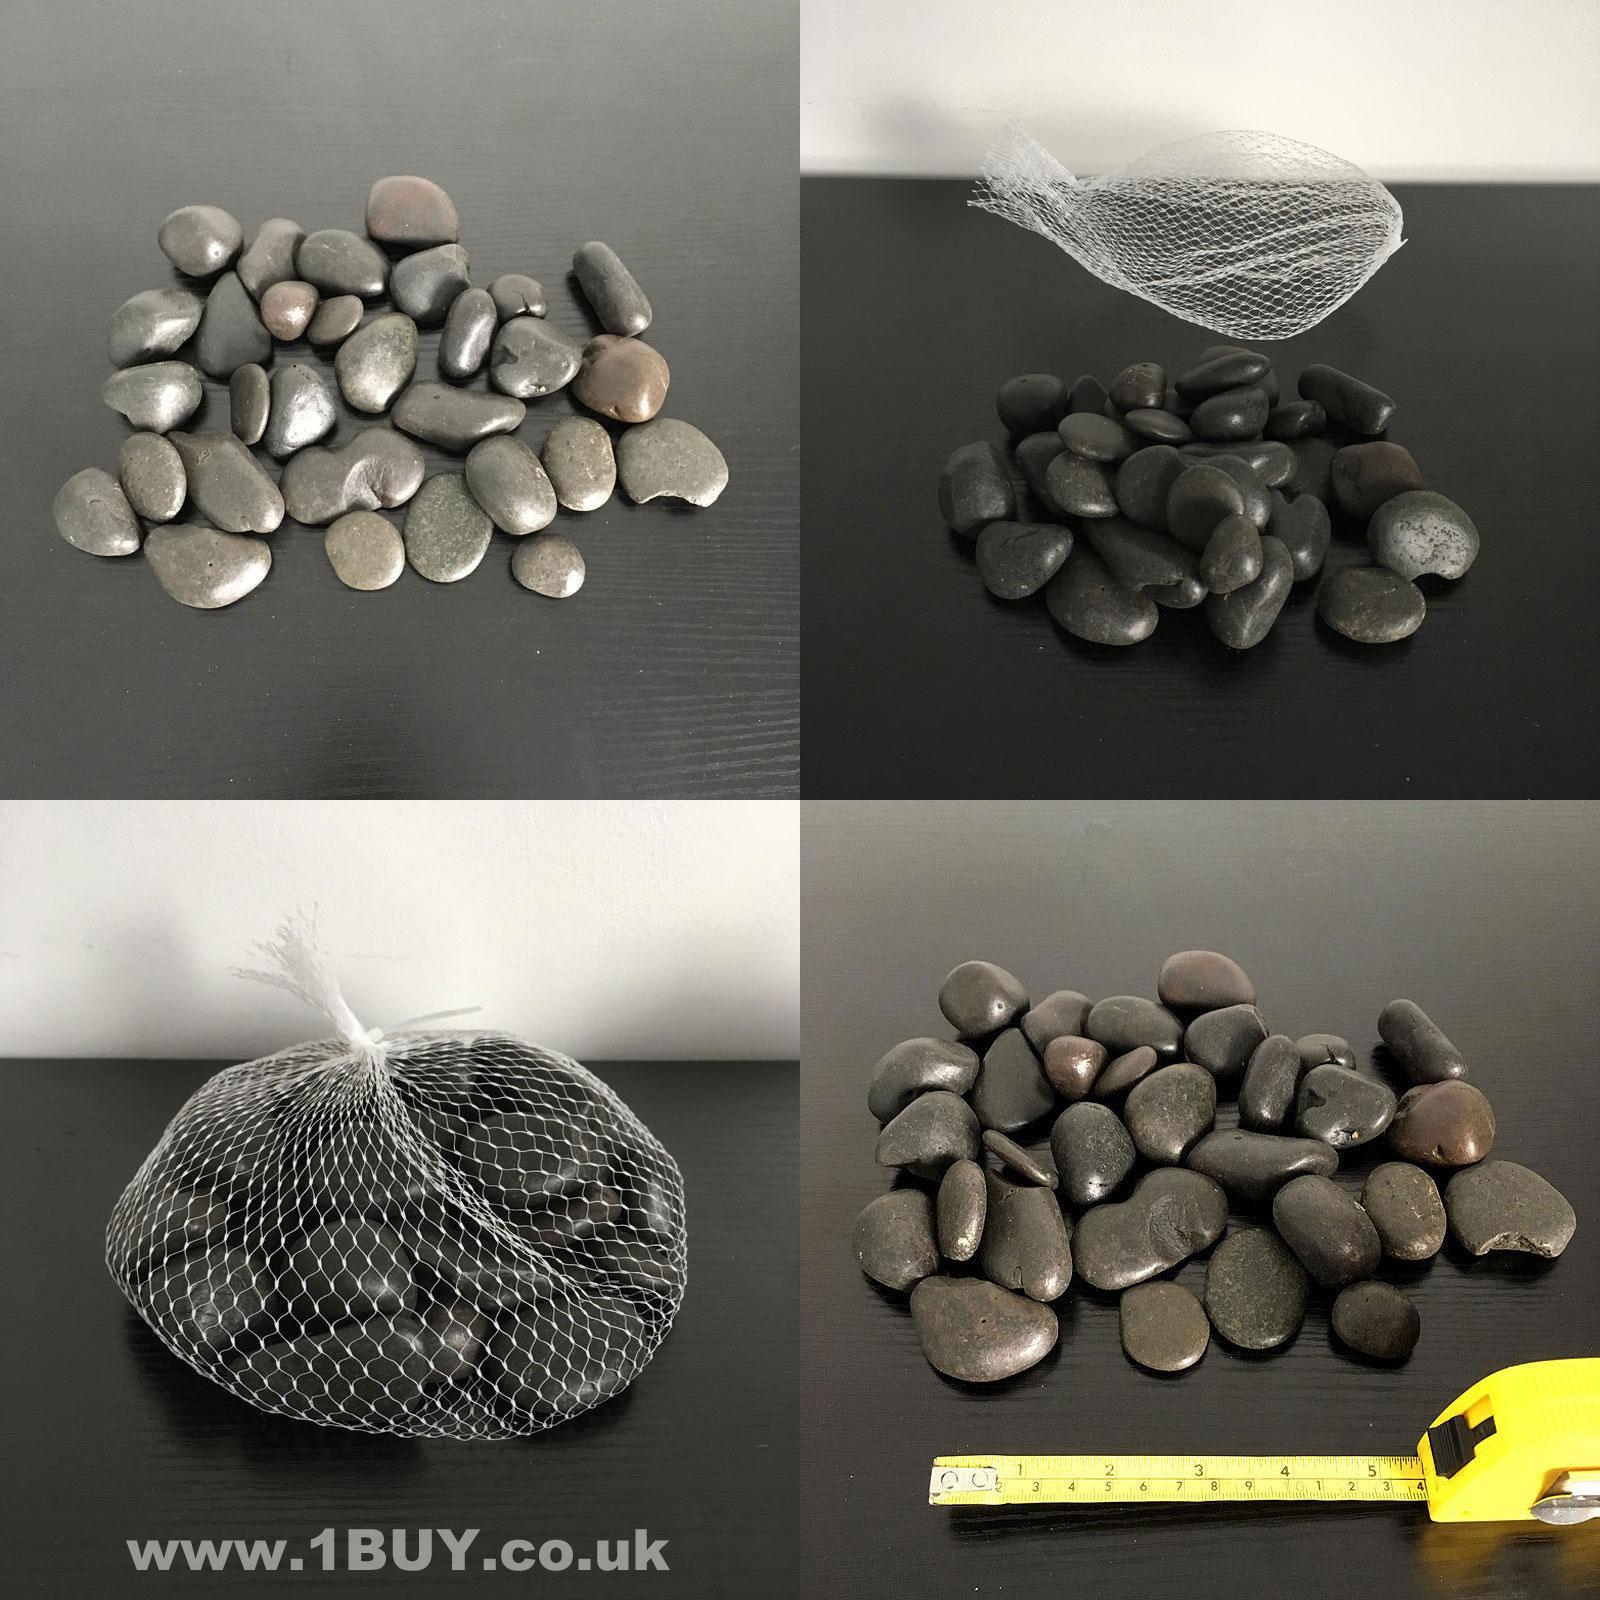 Black Decorative Stone : Kg black decorative stones for vases natural craft